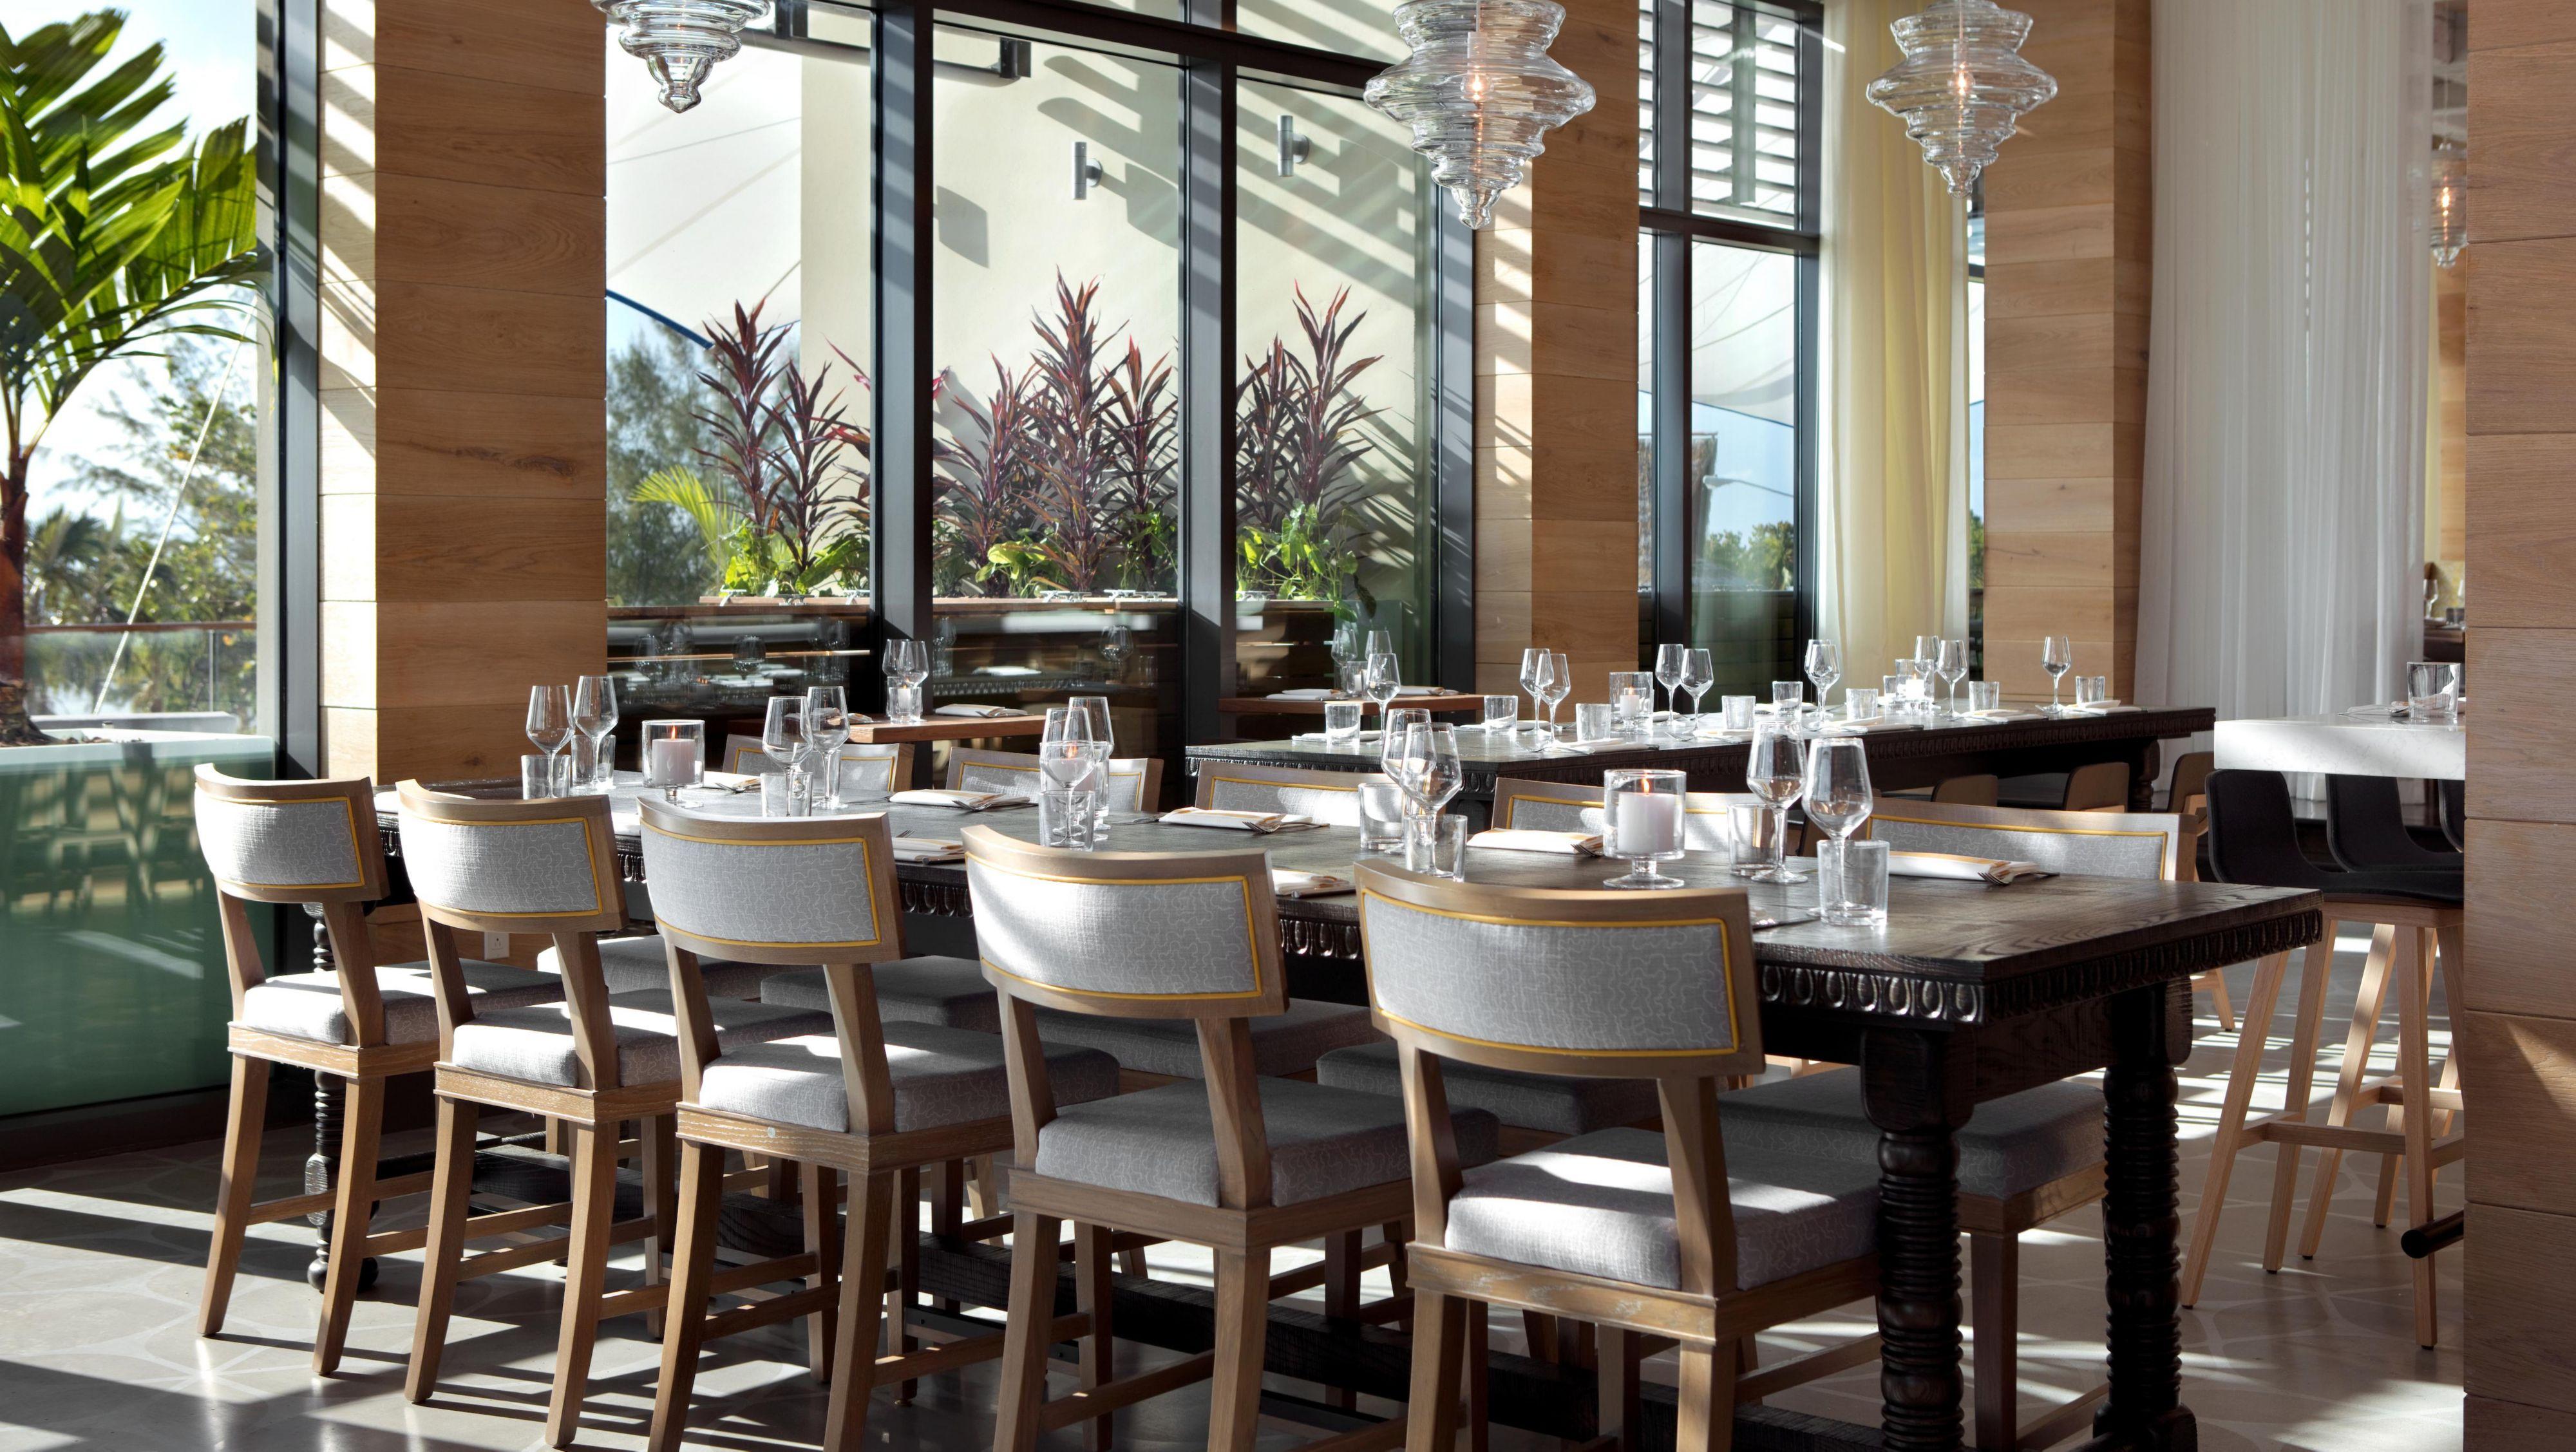 cruises dining grand room mariner oceania pin